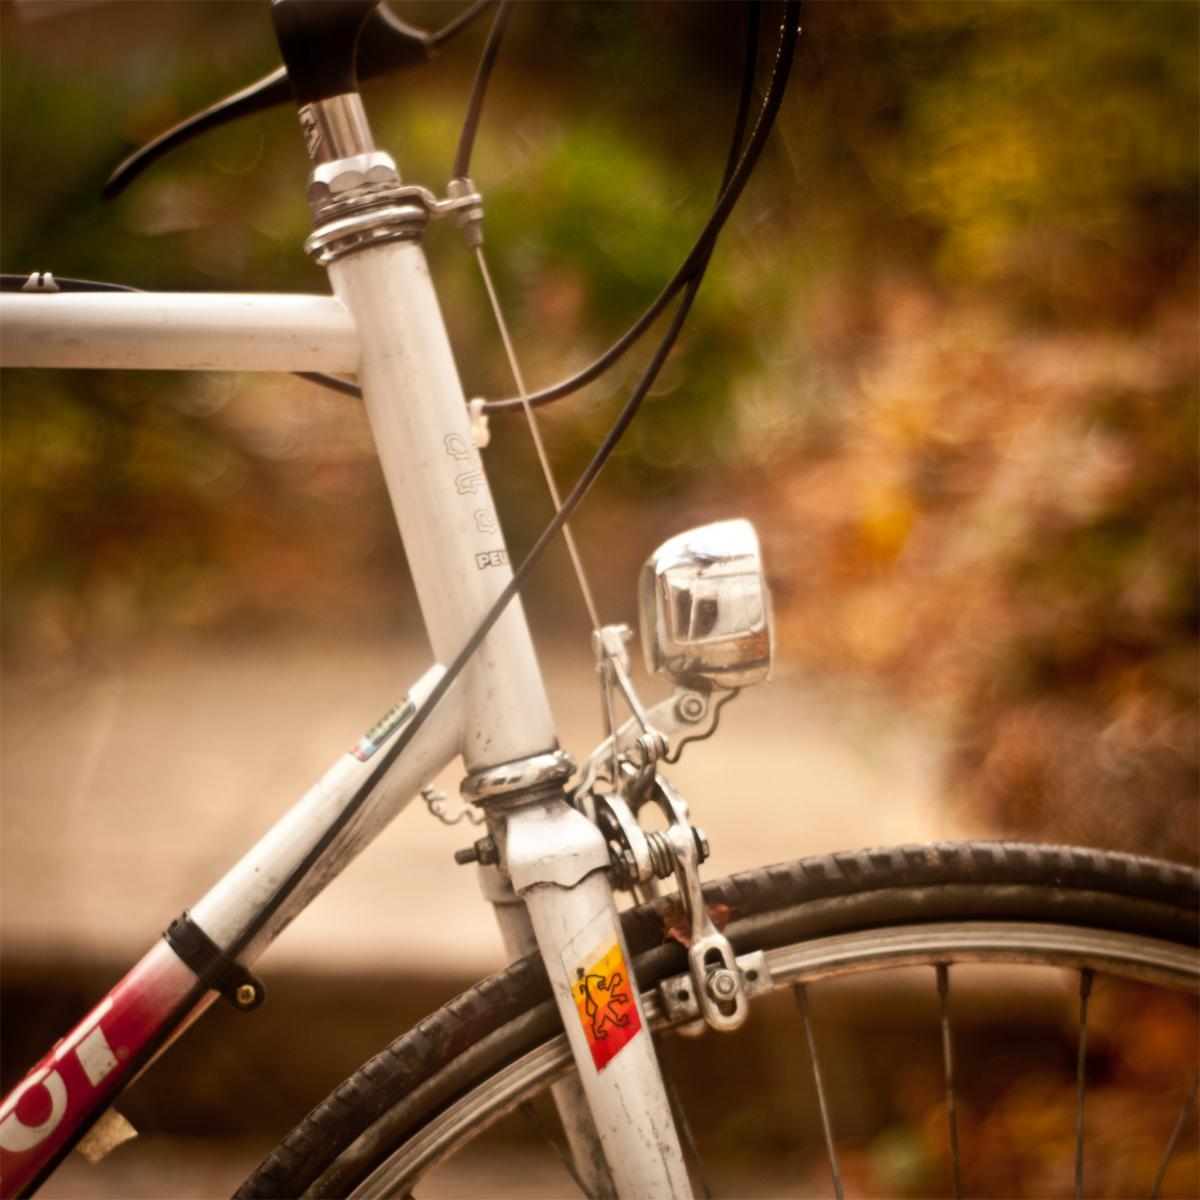 Bike bicycle  #21186